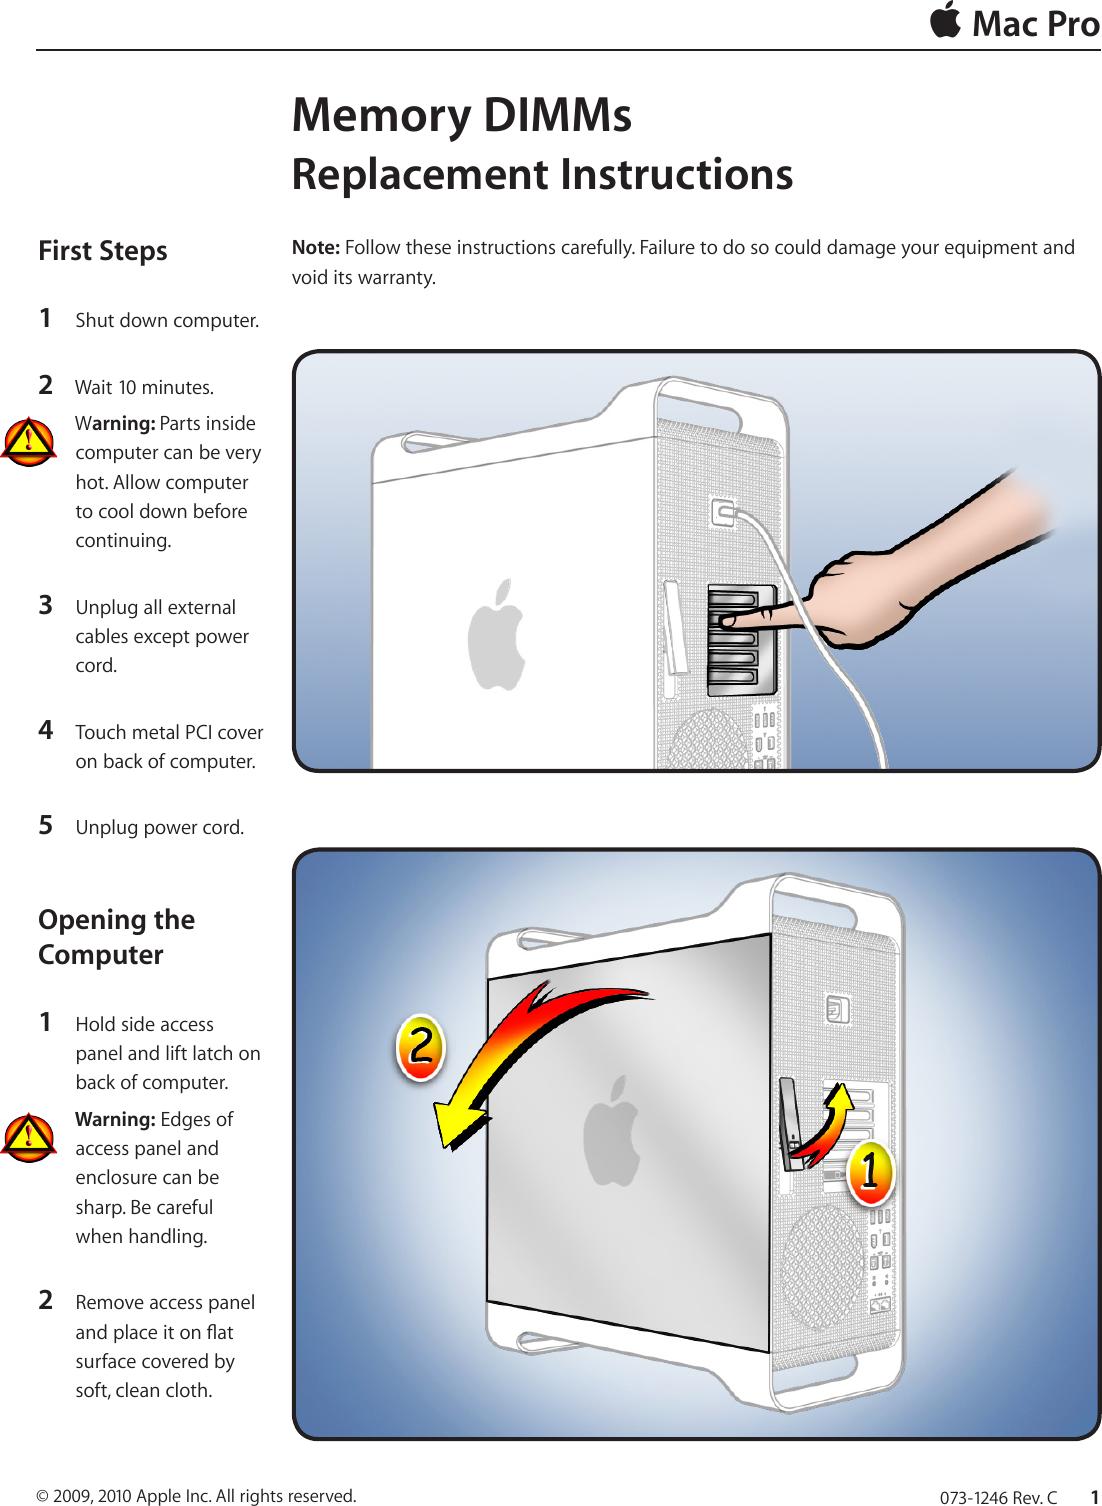 apple macpro early2009 user manual mac pro early2009and mid2010 rh usermanual wiki 2009 Mac Pro Power Supply 2009 Mac Pro Power Supply